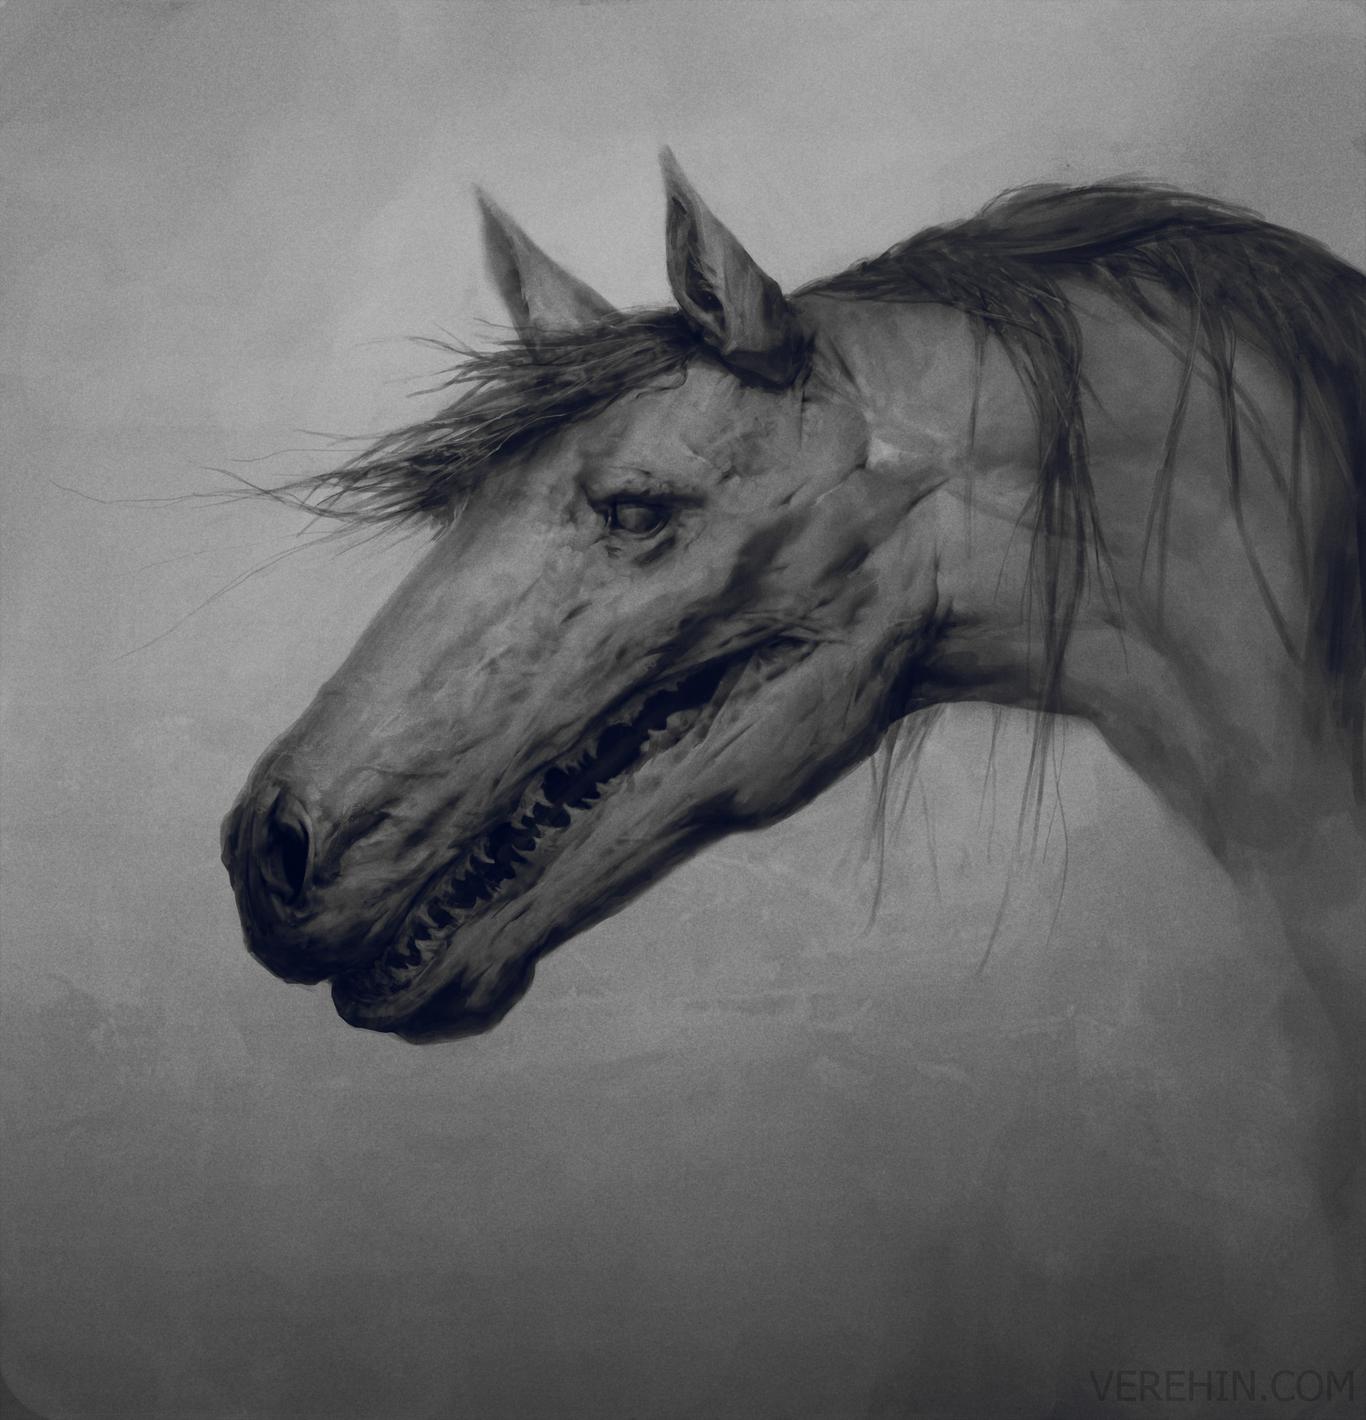 Maxverehin horse 1 8297dbd6 zvbb